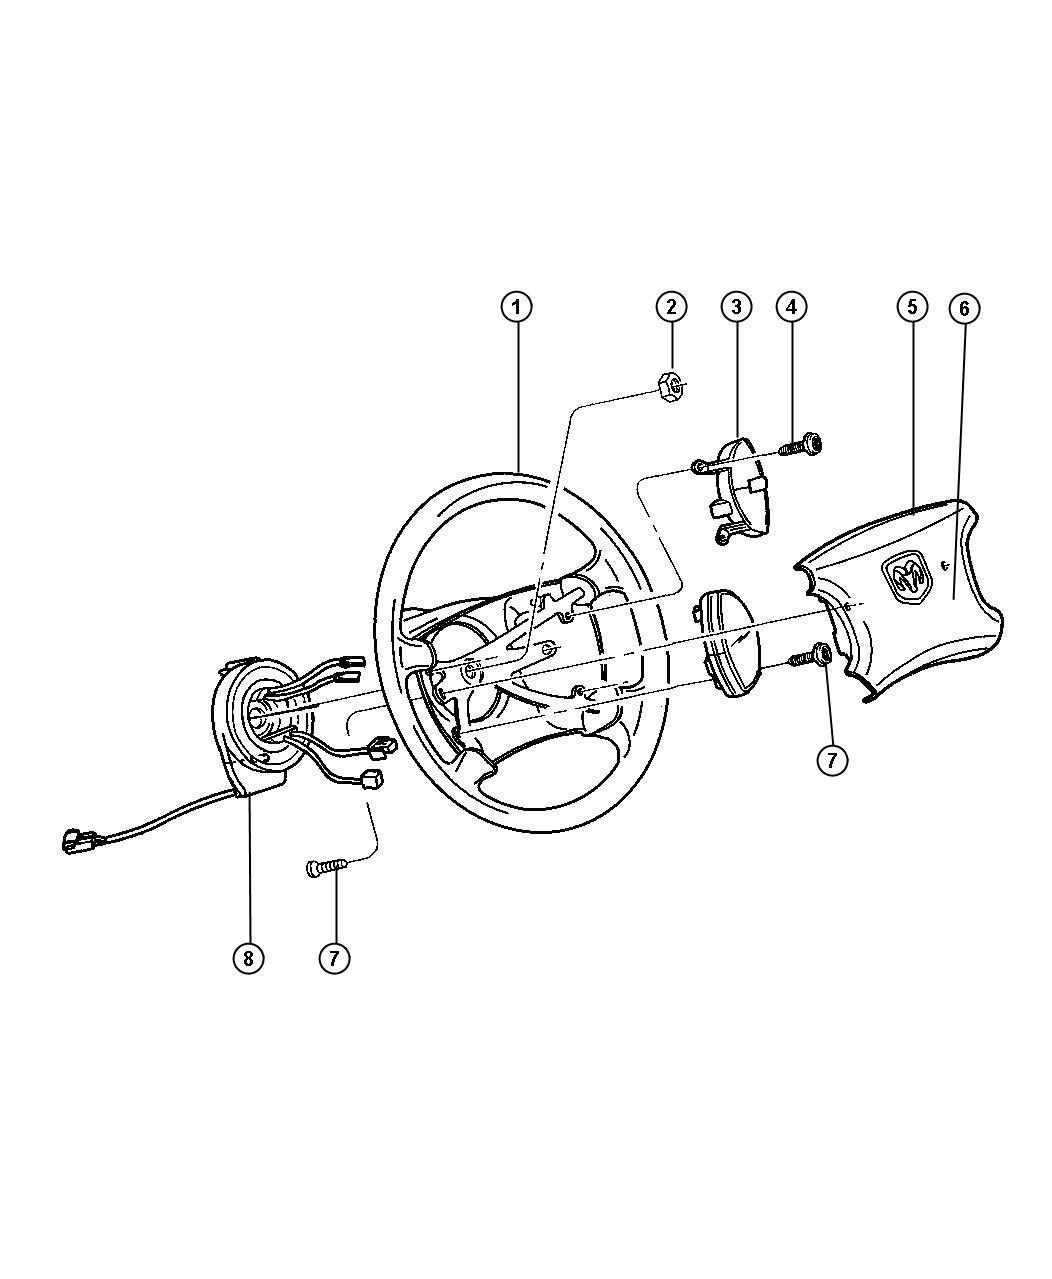 87 k5 blazer wiring diagram hei install wiring diagram database tags 1985 k5 blazer wiring diagram 1983 k5 blazer wiring diagram 87 k5 blazer wiring diagram 88 k5 blazer wiring diagram chevy blazer wiring diagram 85 k5